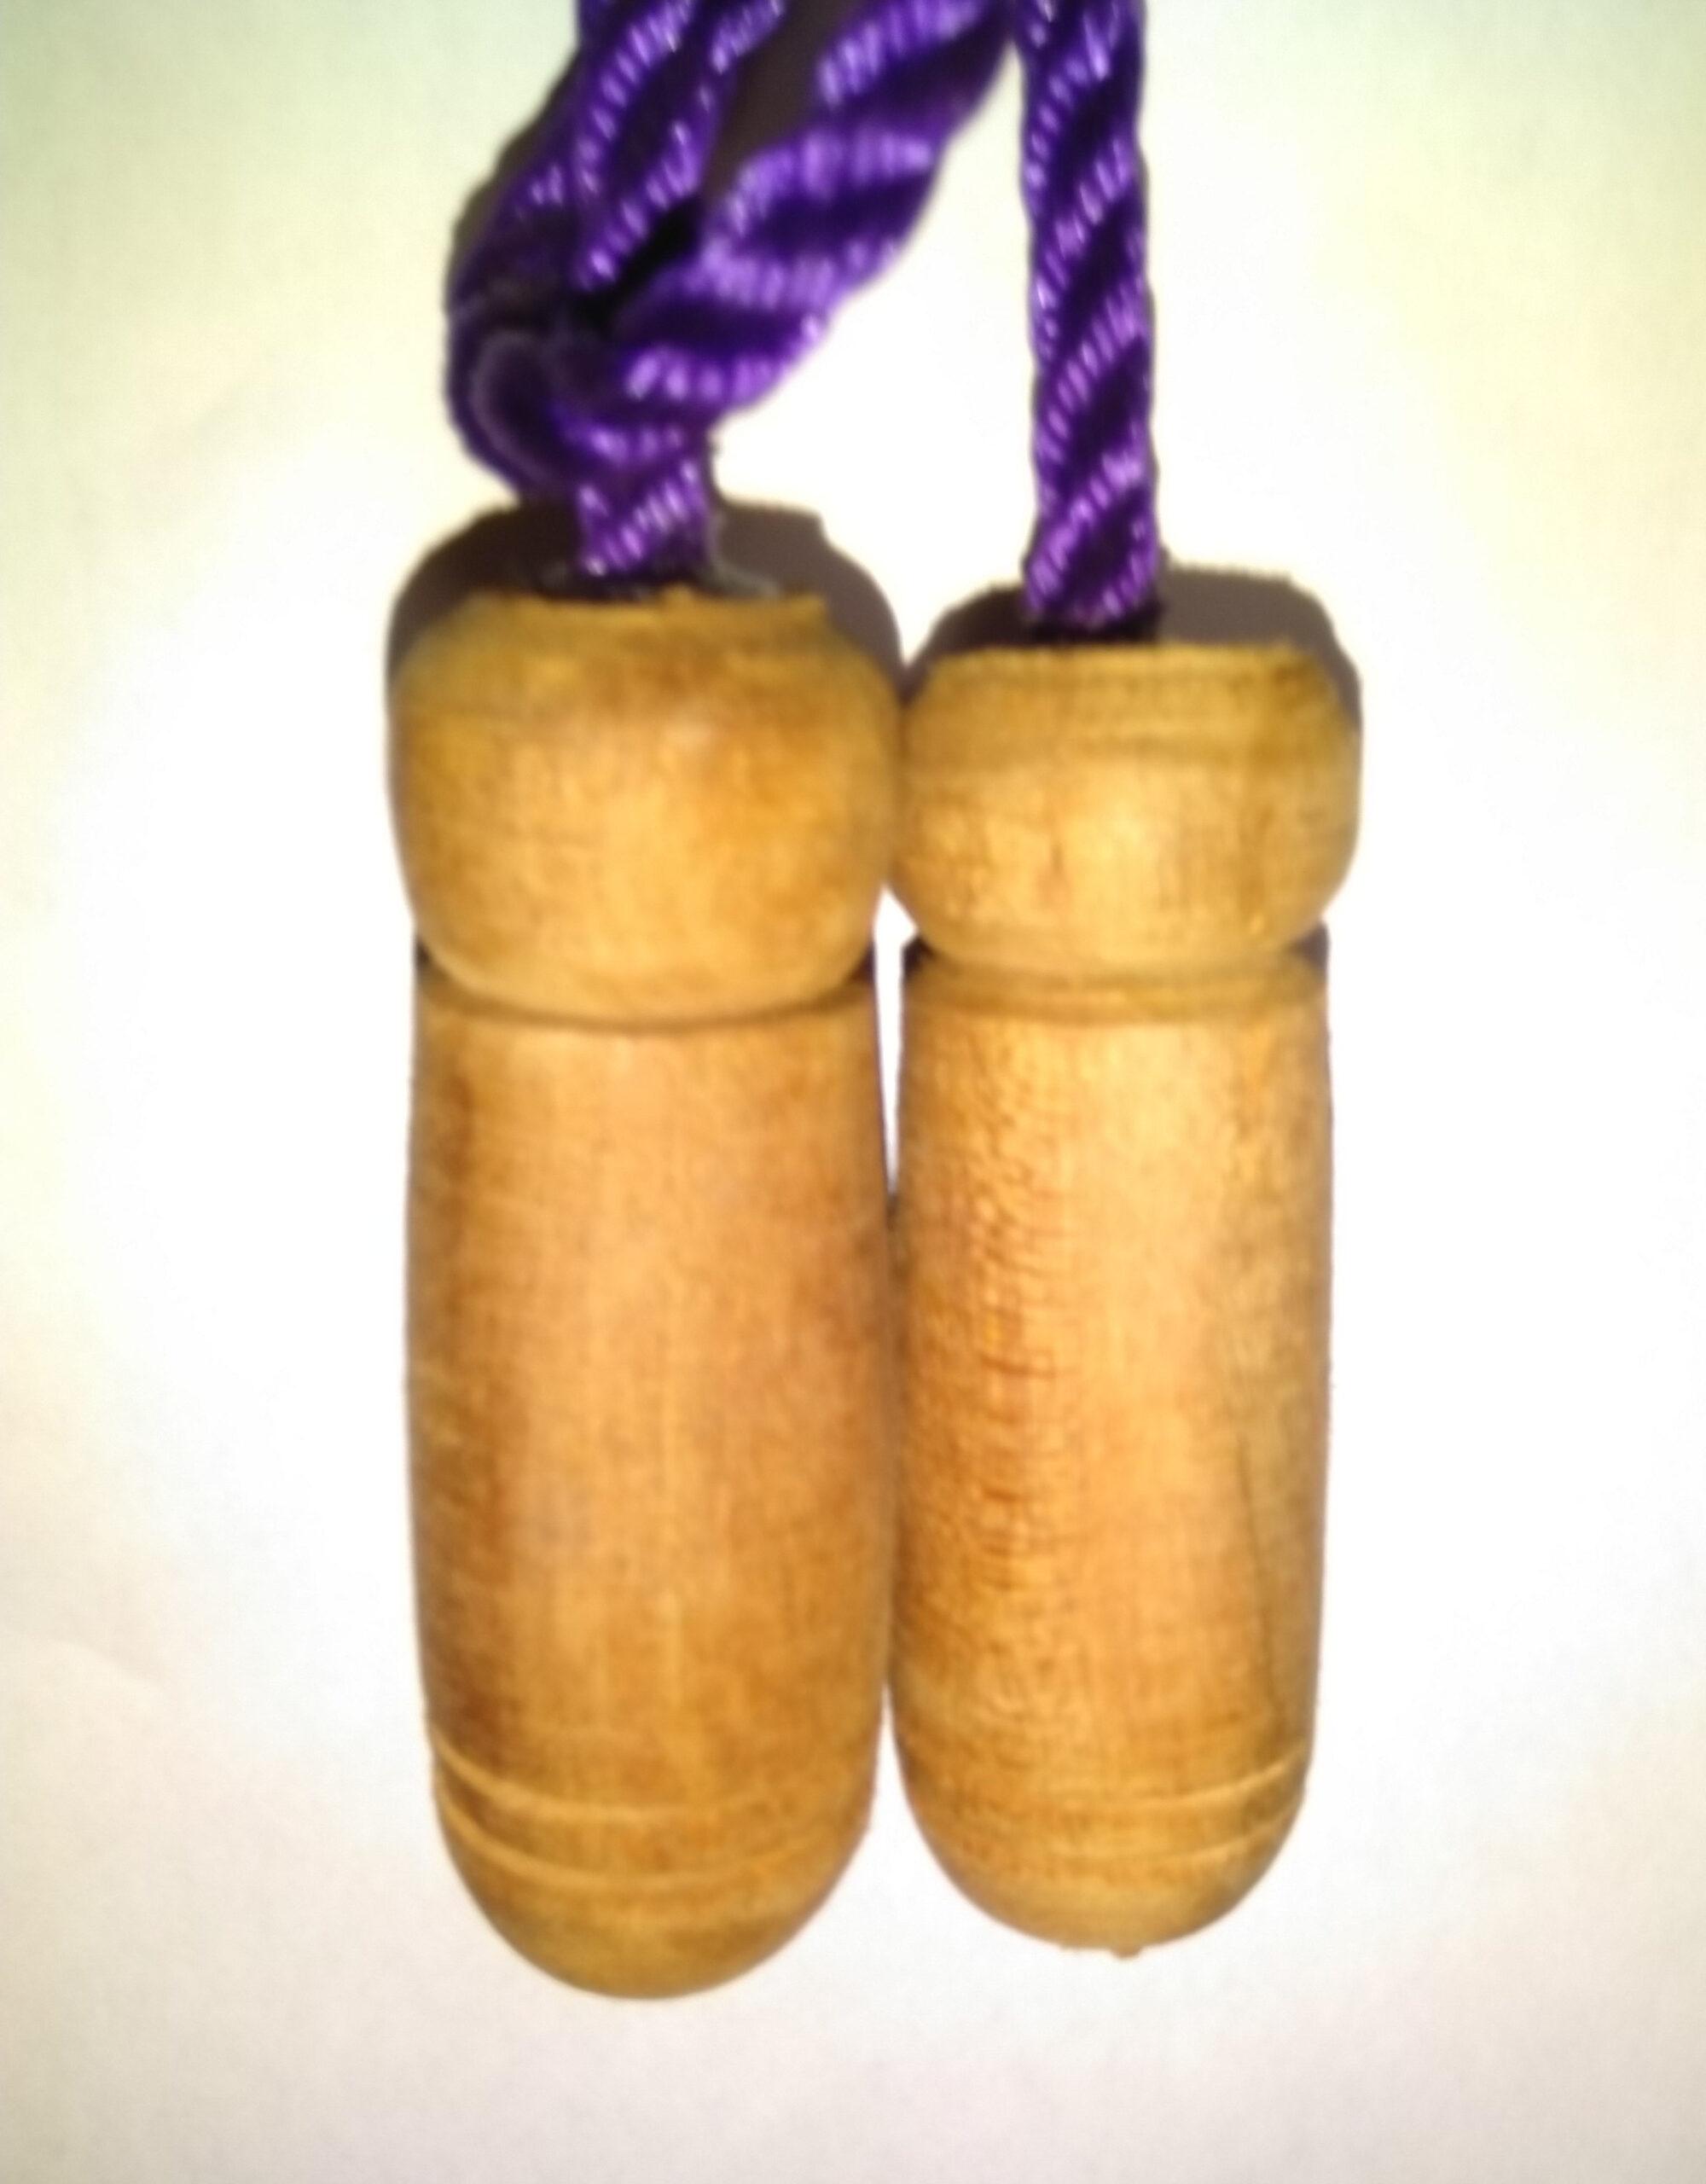 Jump rope handles